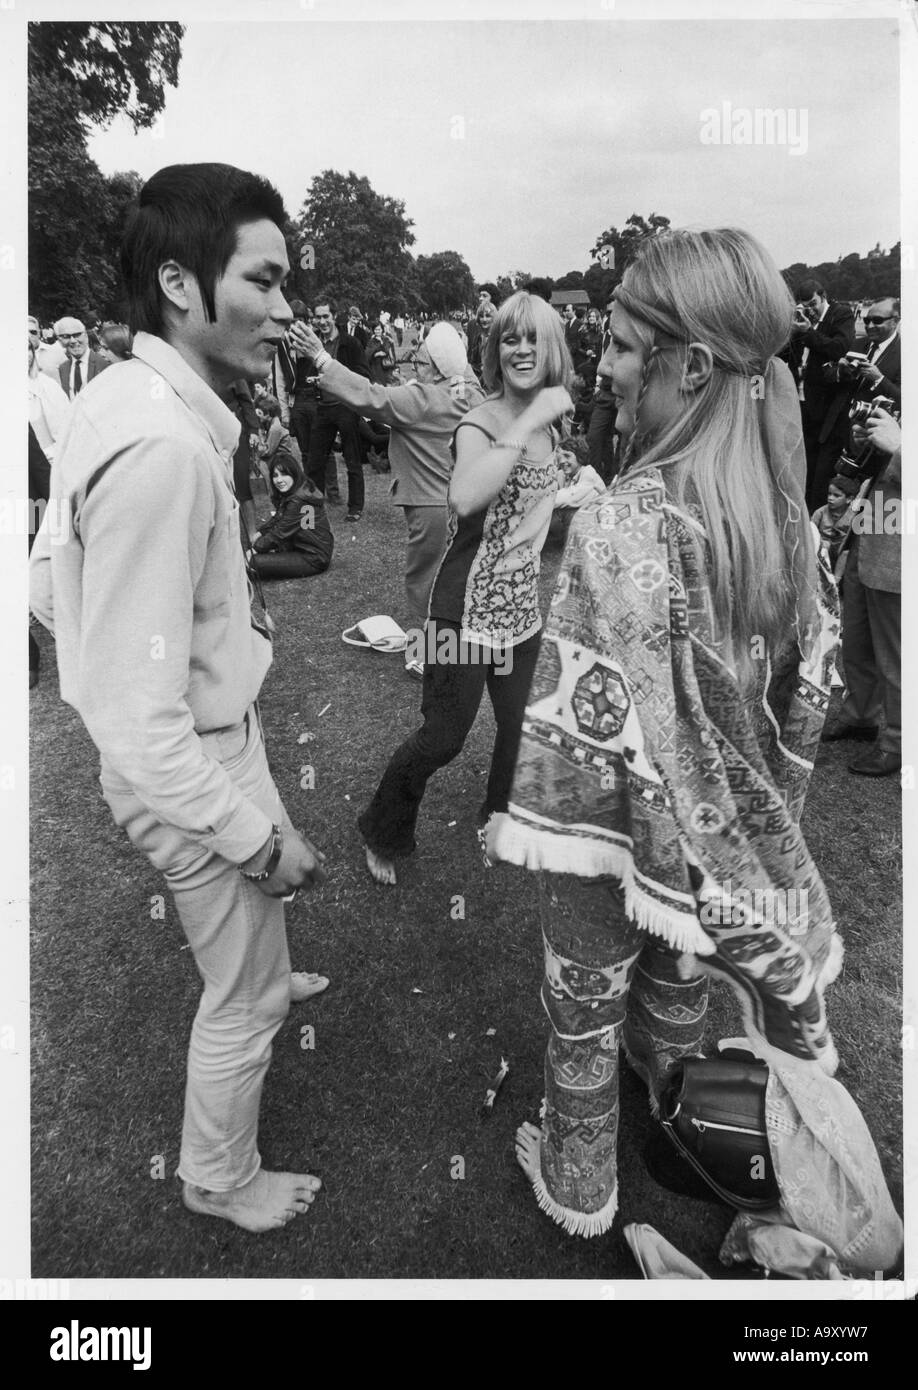 Hippies London Festival - Stock Image